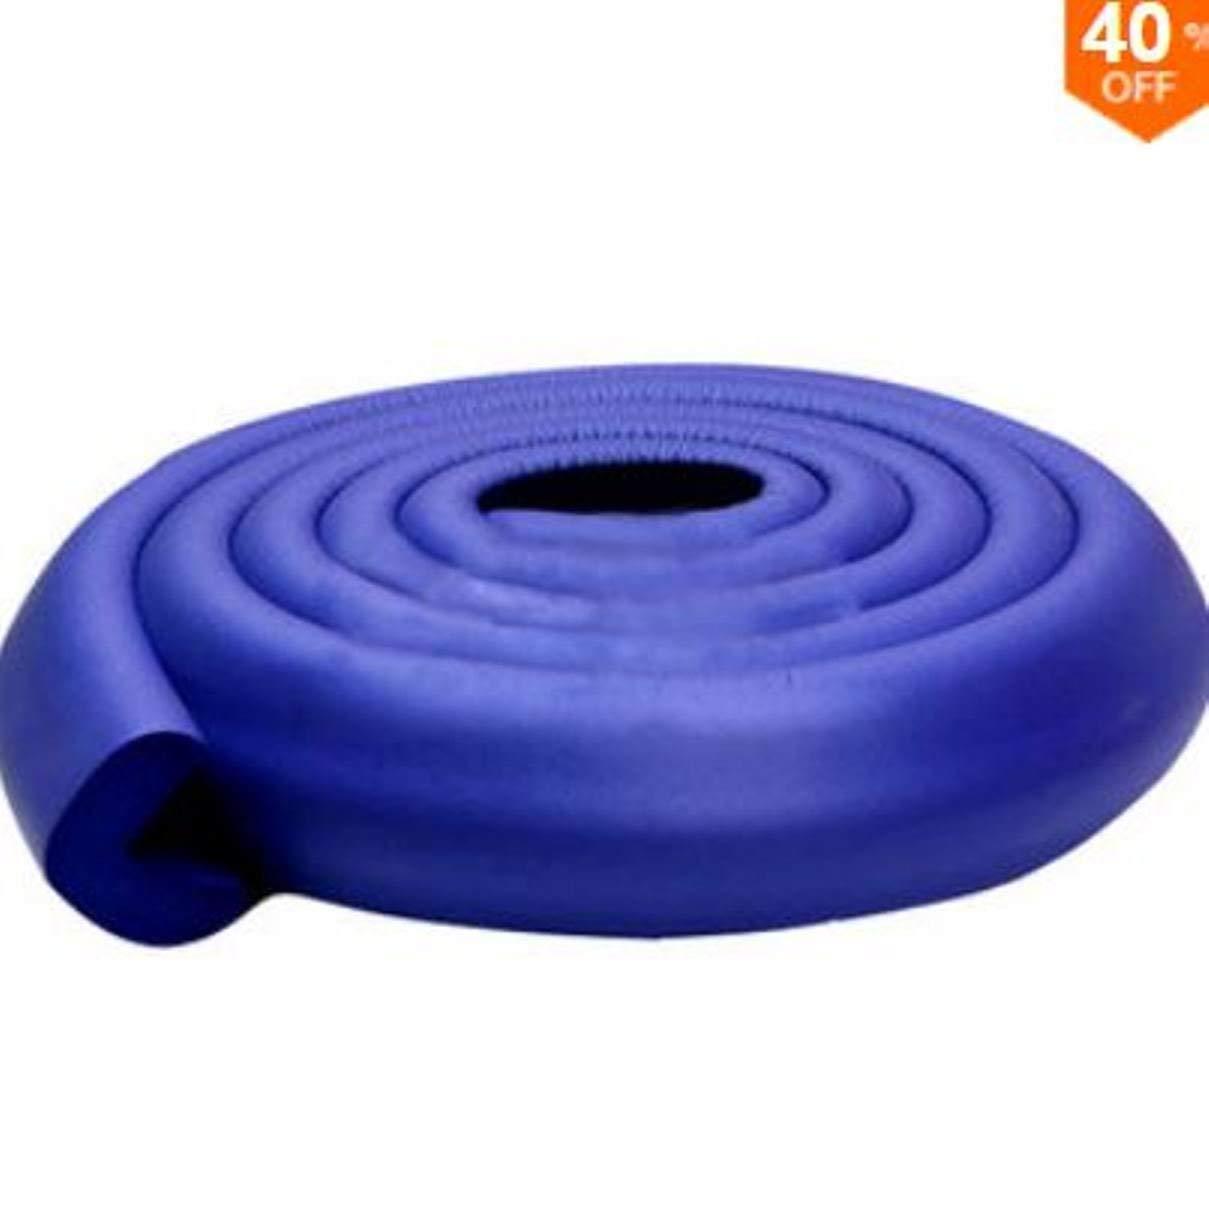 UL BC-SP01 200CM L Shape Thicken Baby Safety Corner Protector Edge Cushion (purple)